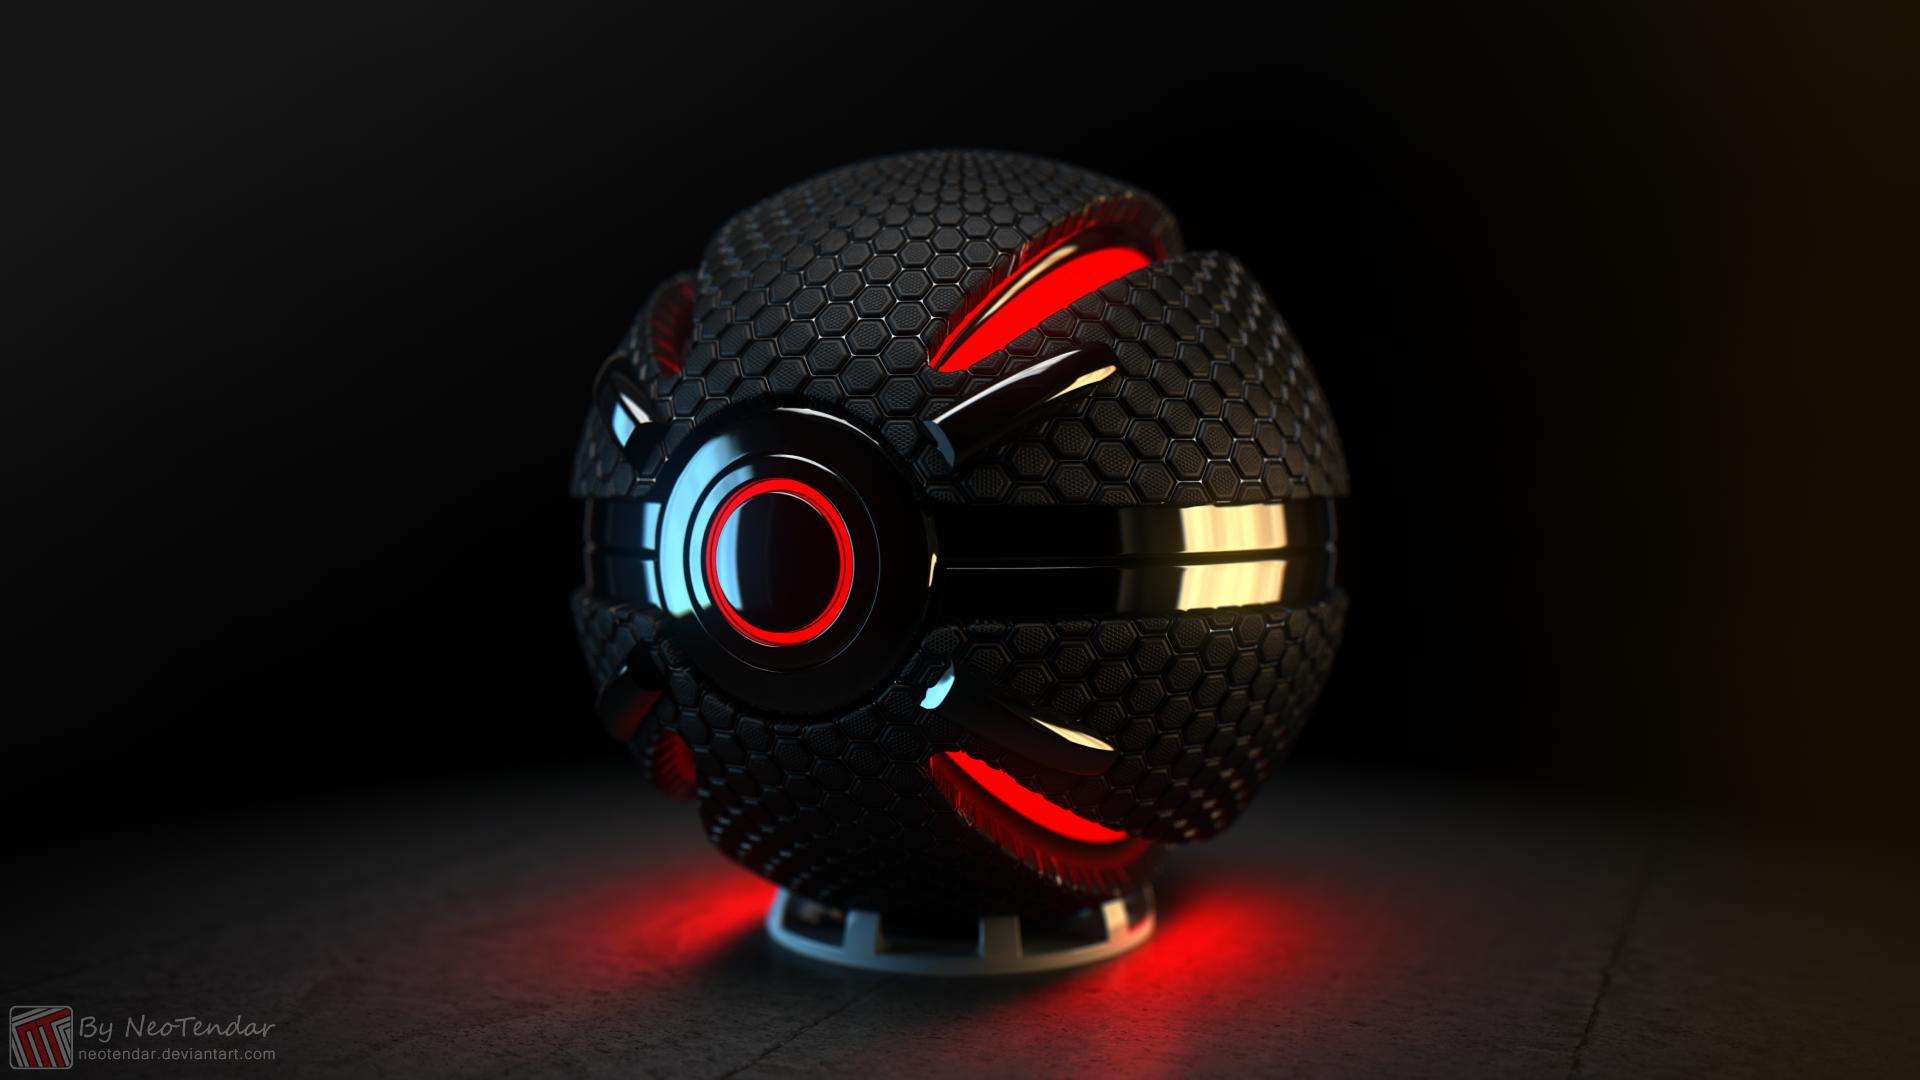 PKMN Unlimited - MasterBall 2.0